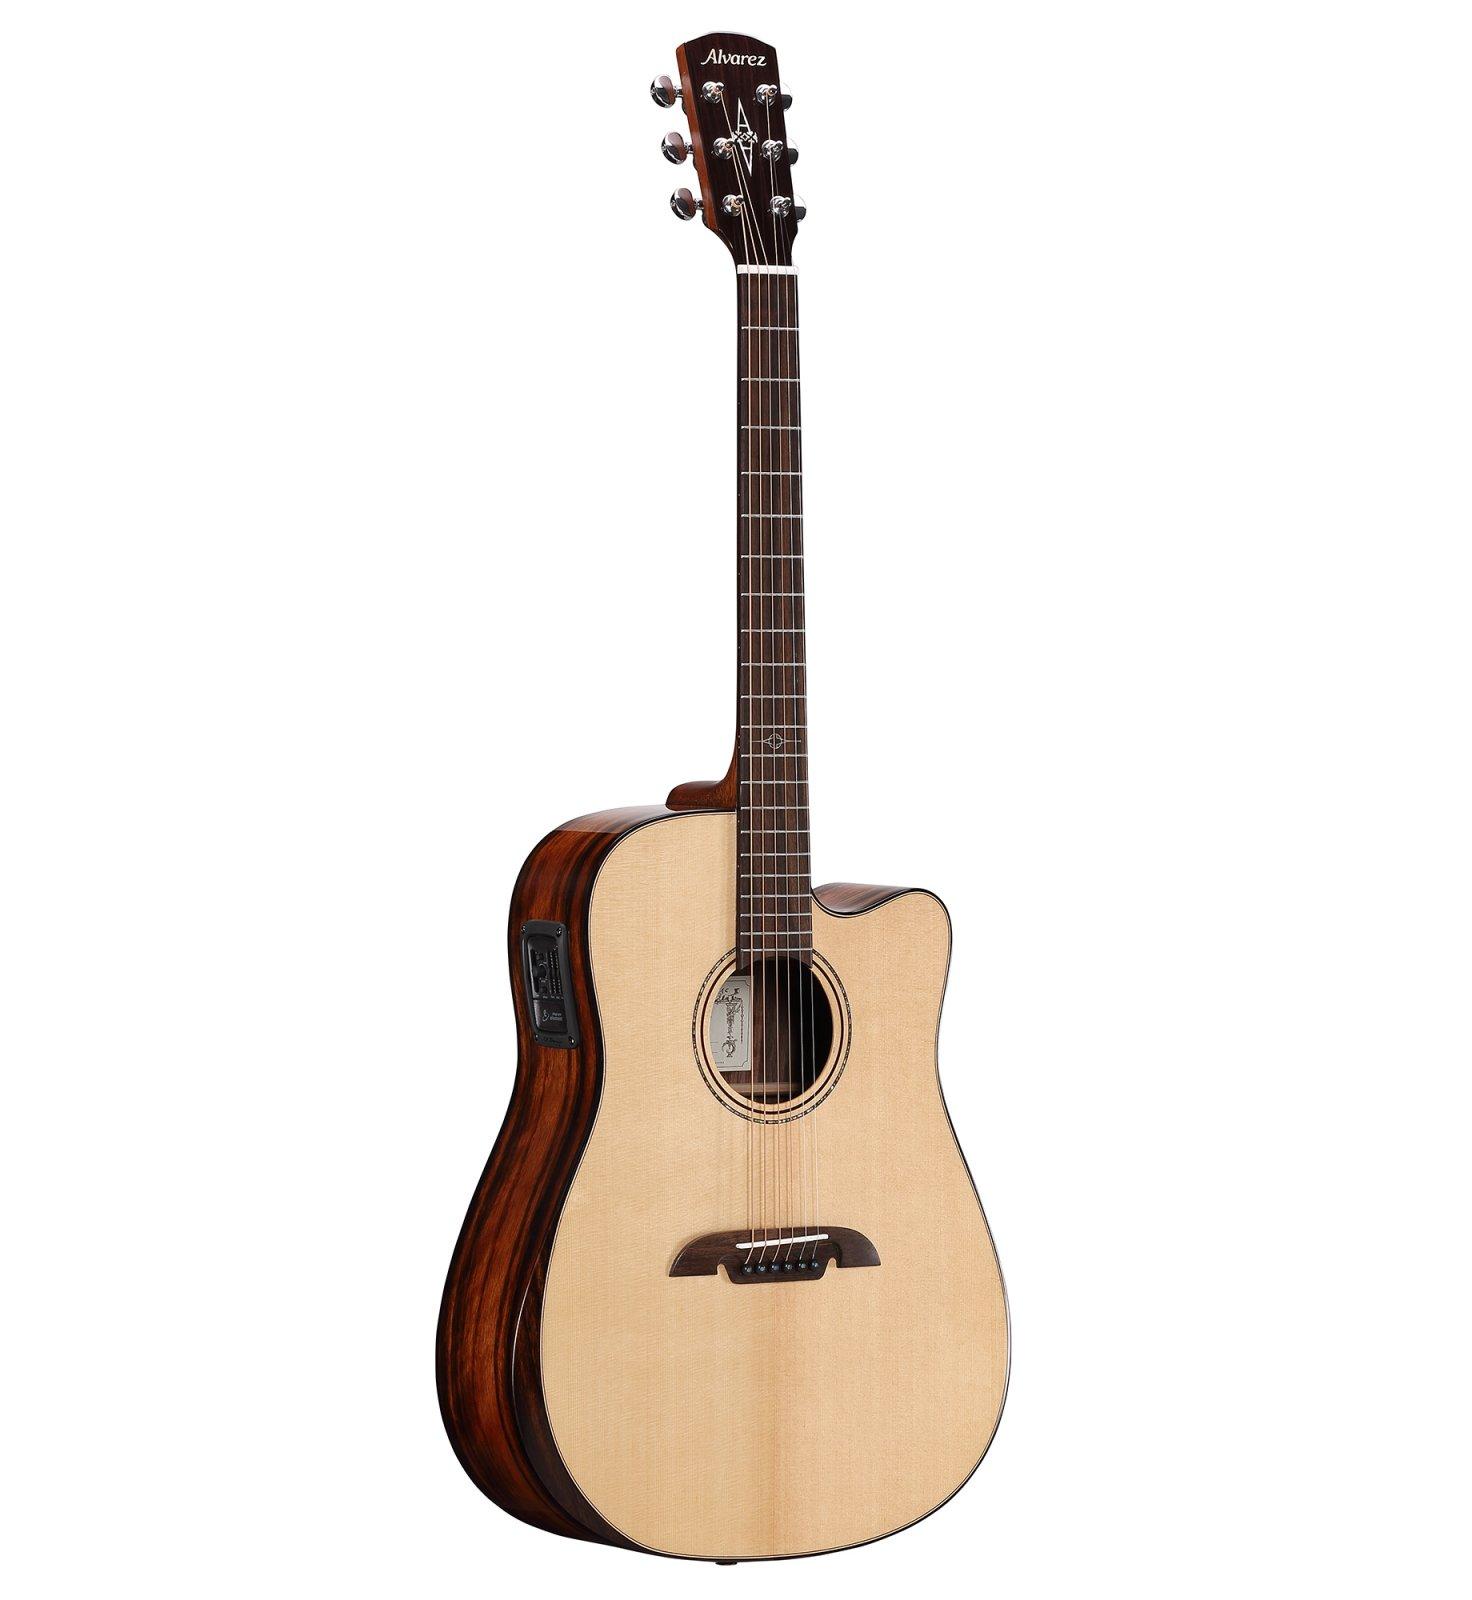 Alvarez ADE90CEAR Artist Elite Acoustic Electric Guitar